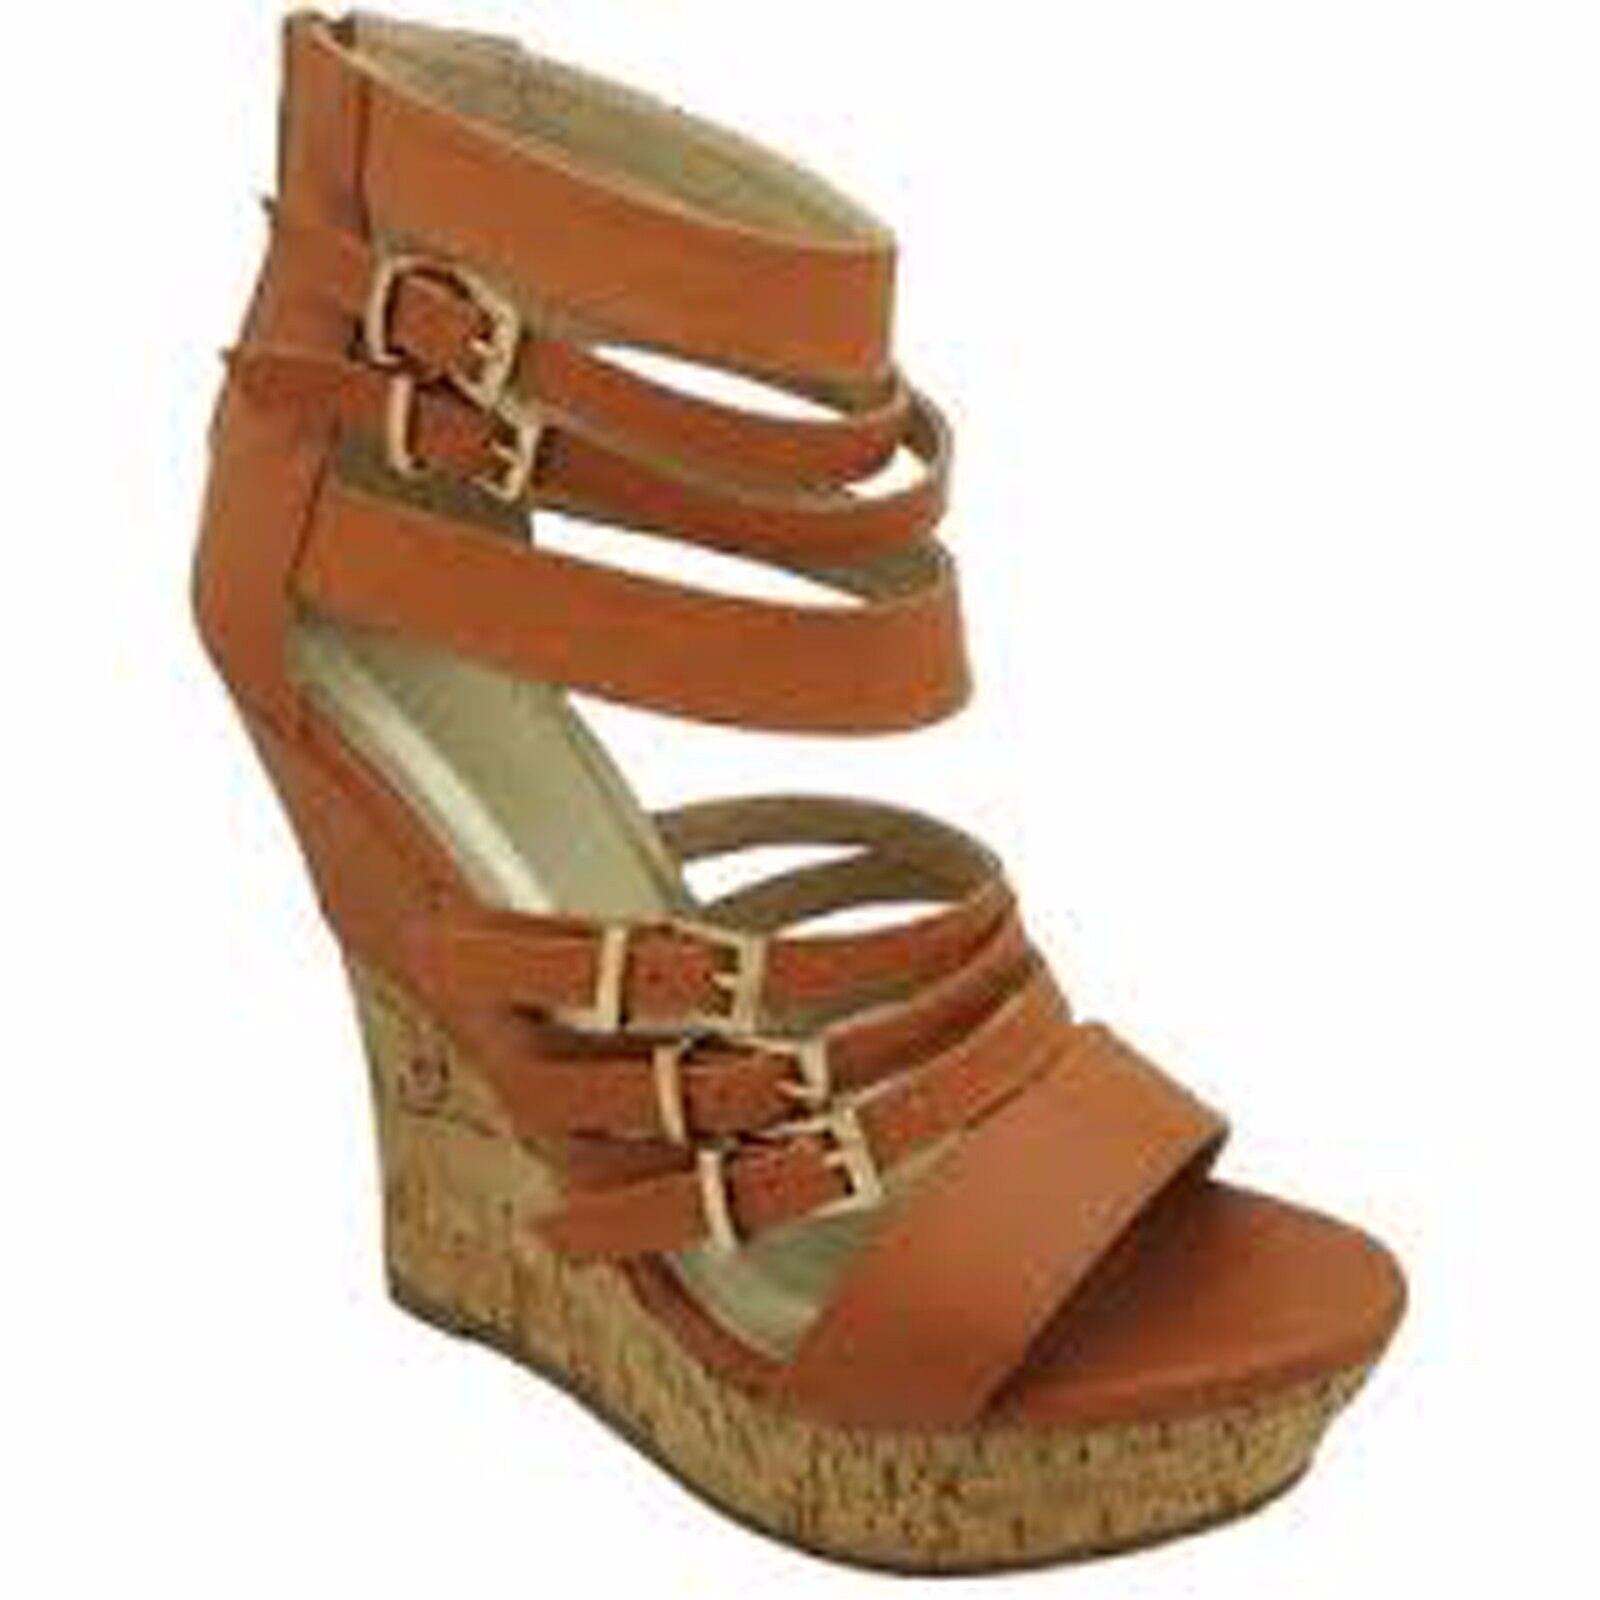 New French blue Ada High Wedge Sandals women's sz 7.5